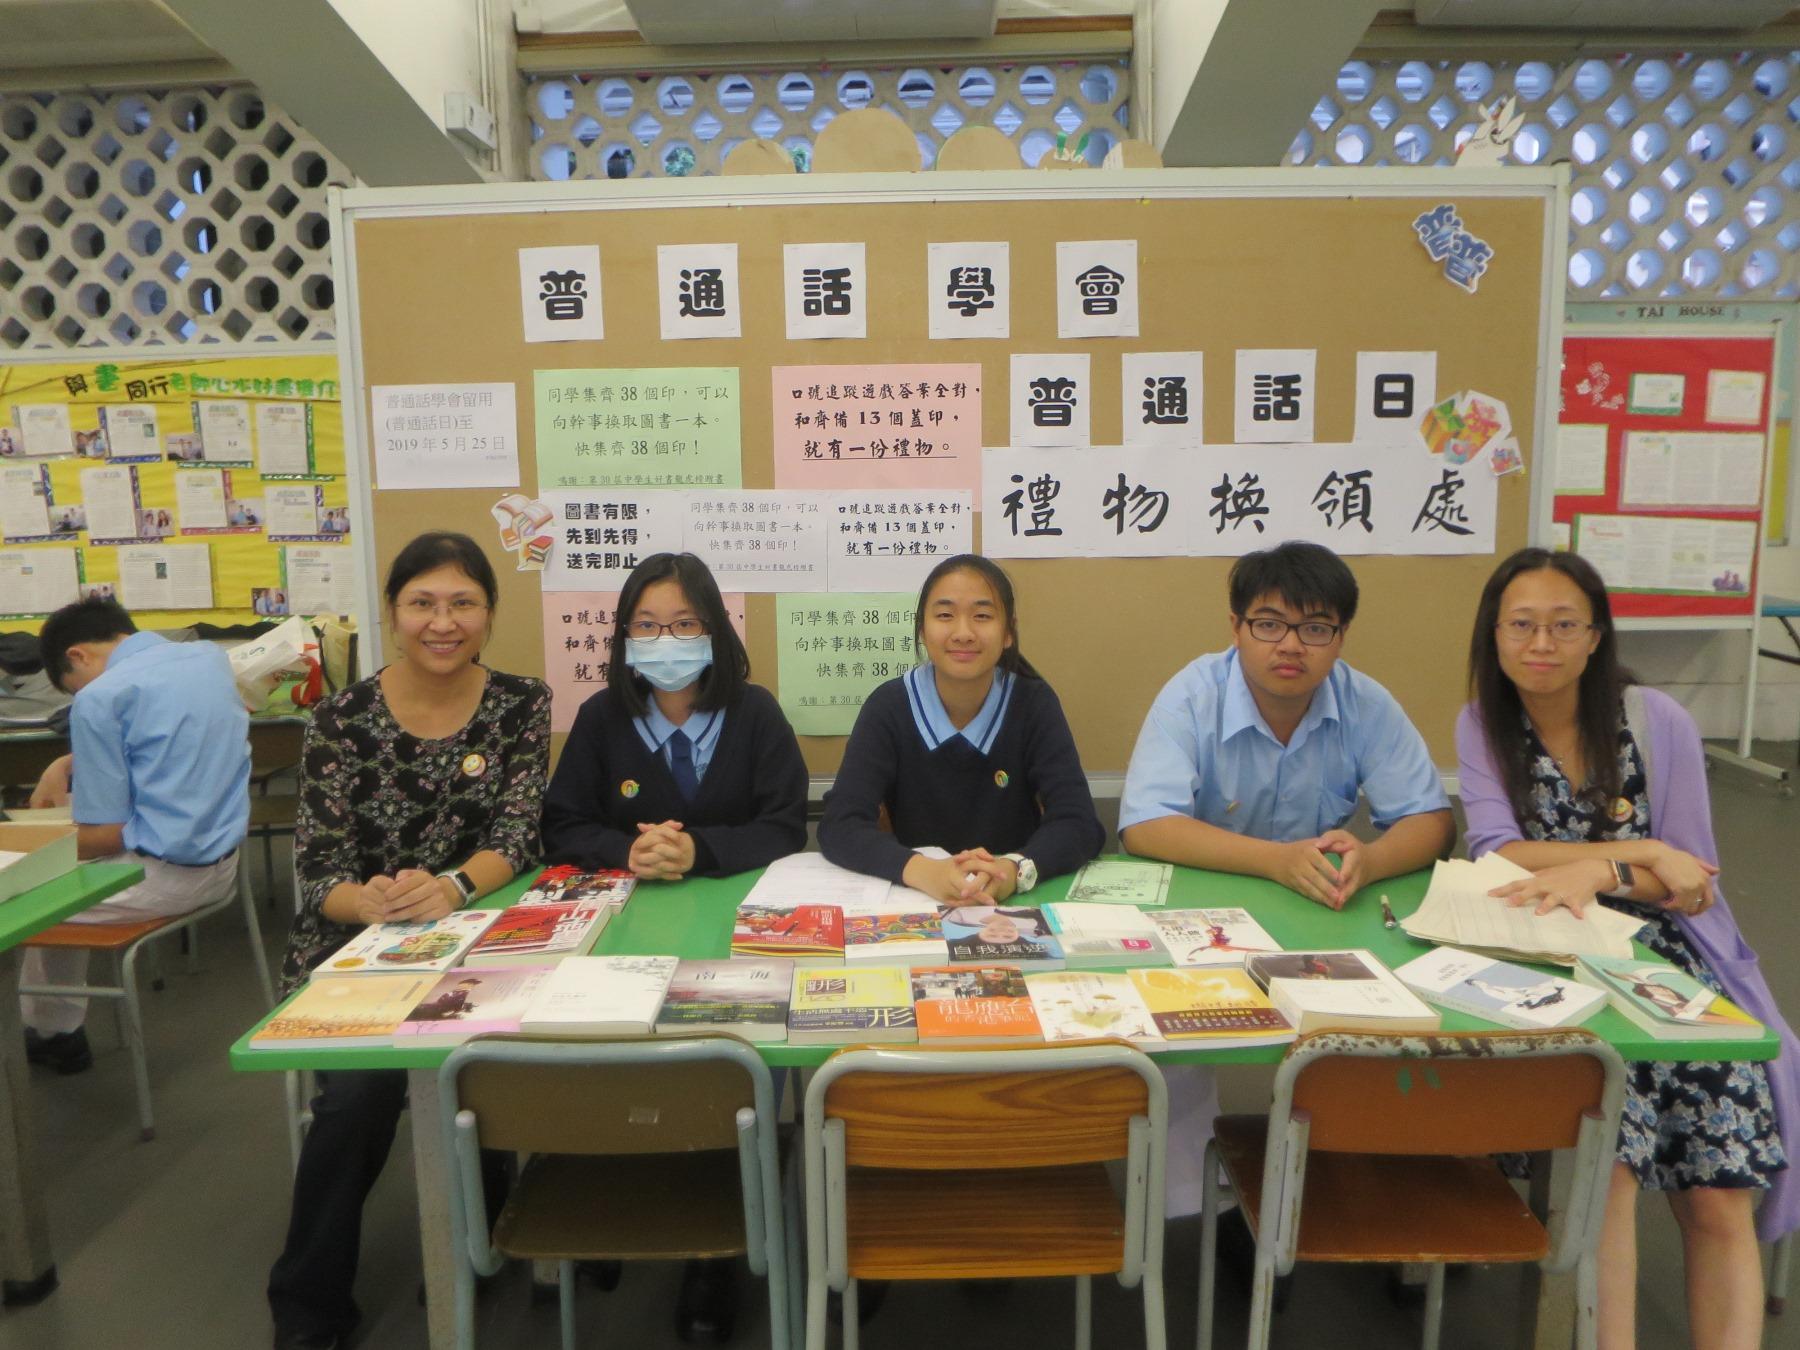 http://npc.edu.hk/sites/default/files/img_1707.jpg